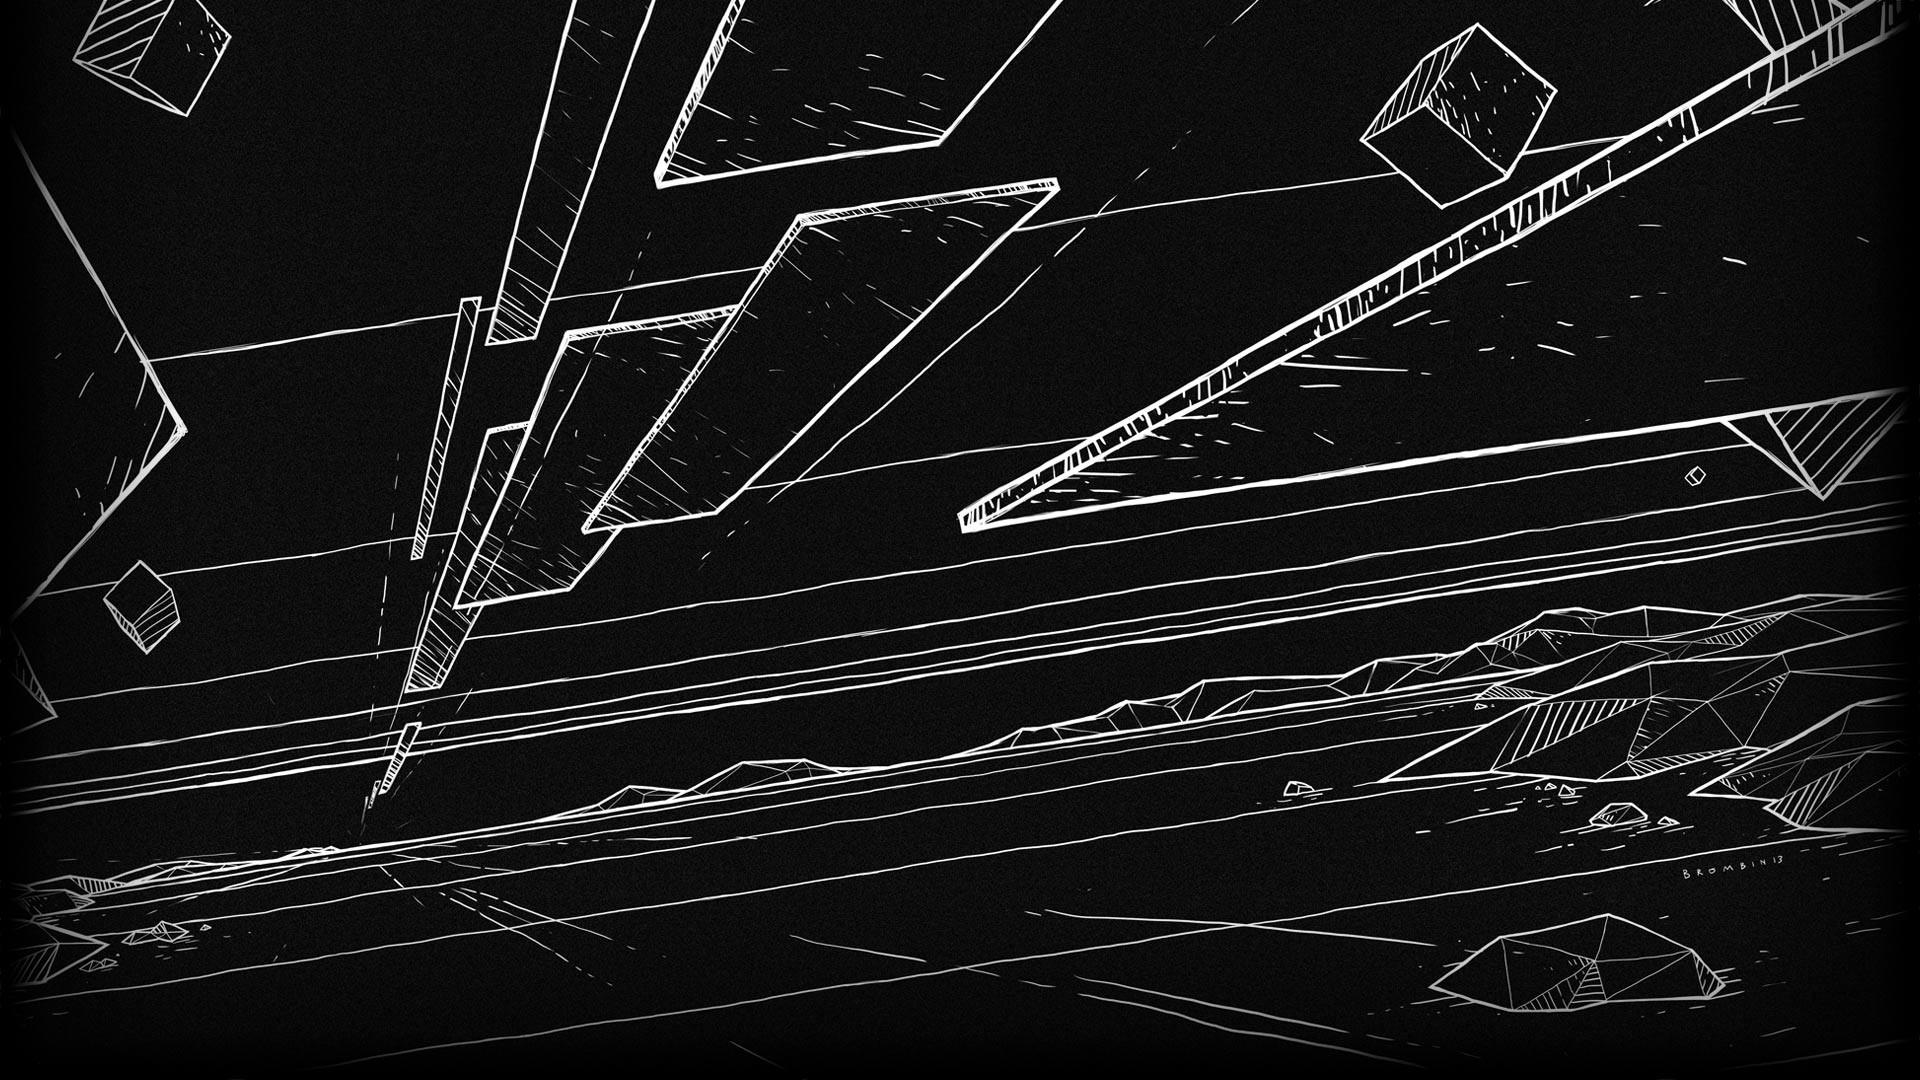 Aesthetic Wallpaper Wallpaper Laptop Tumblr Black Novocom Top